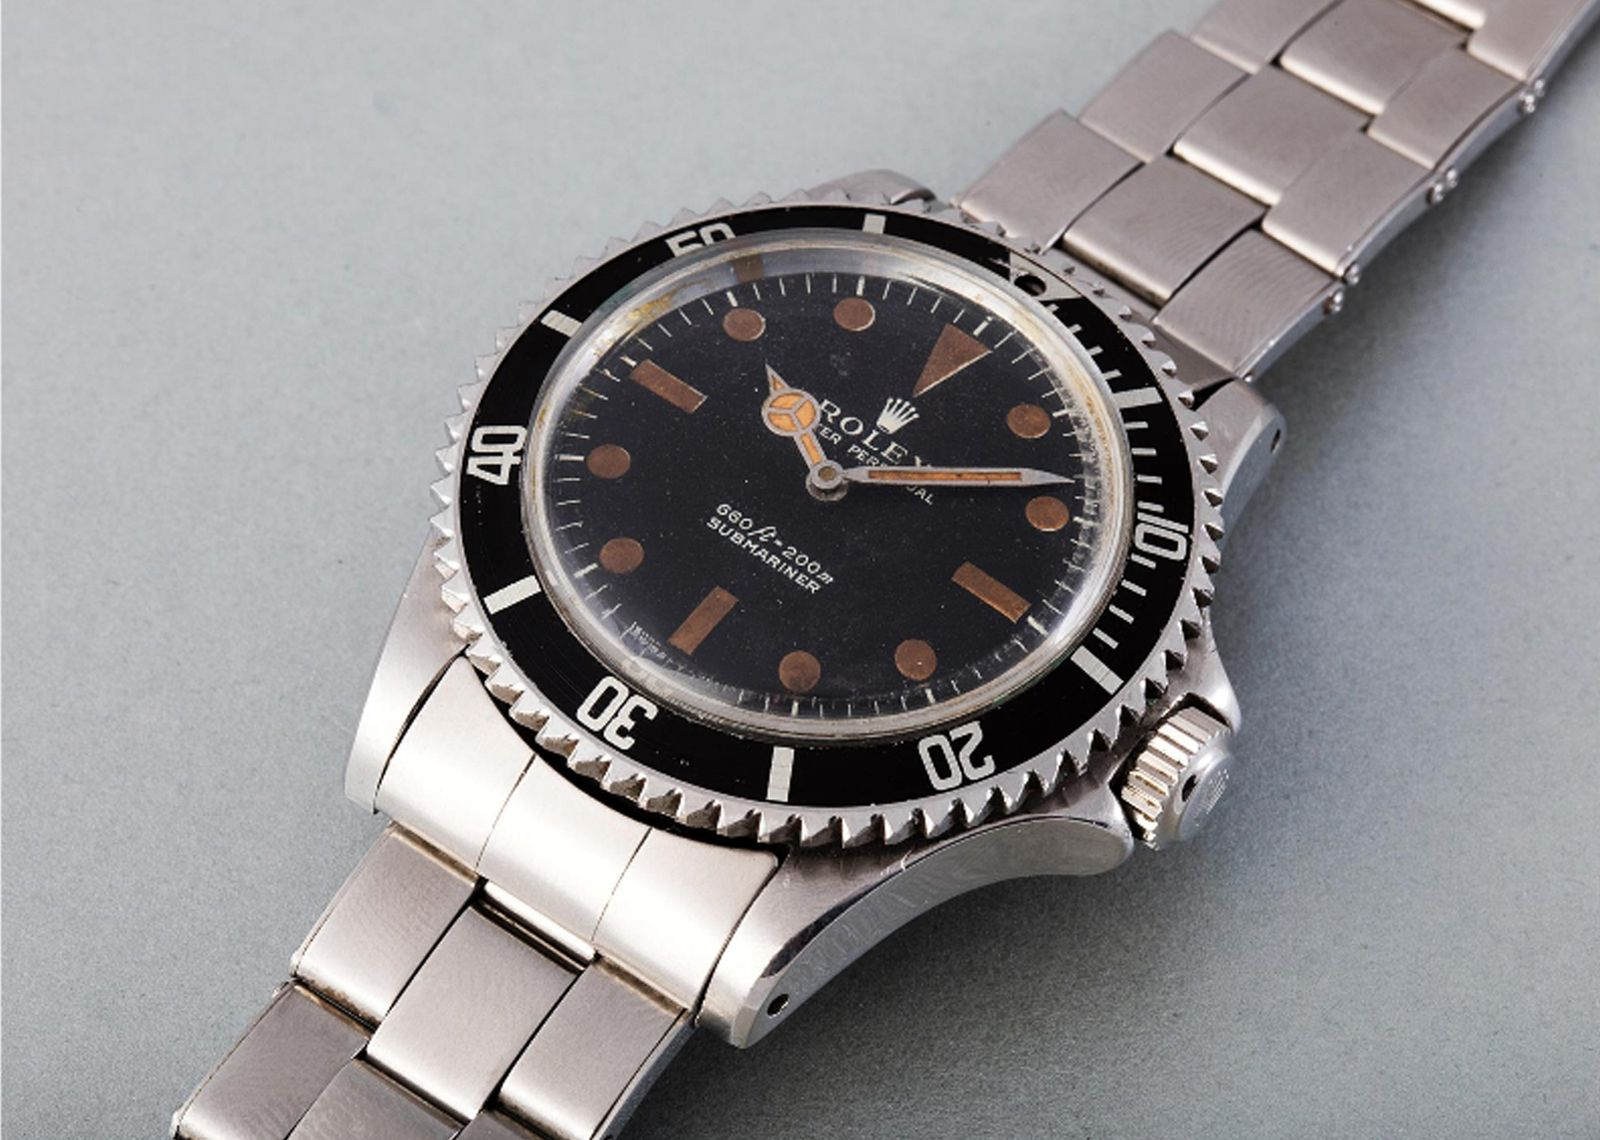 Rolex/ James Bond/ Versteigerung